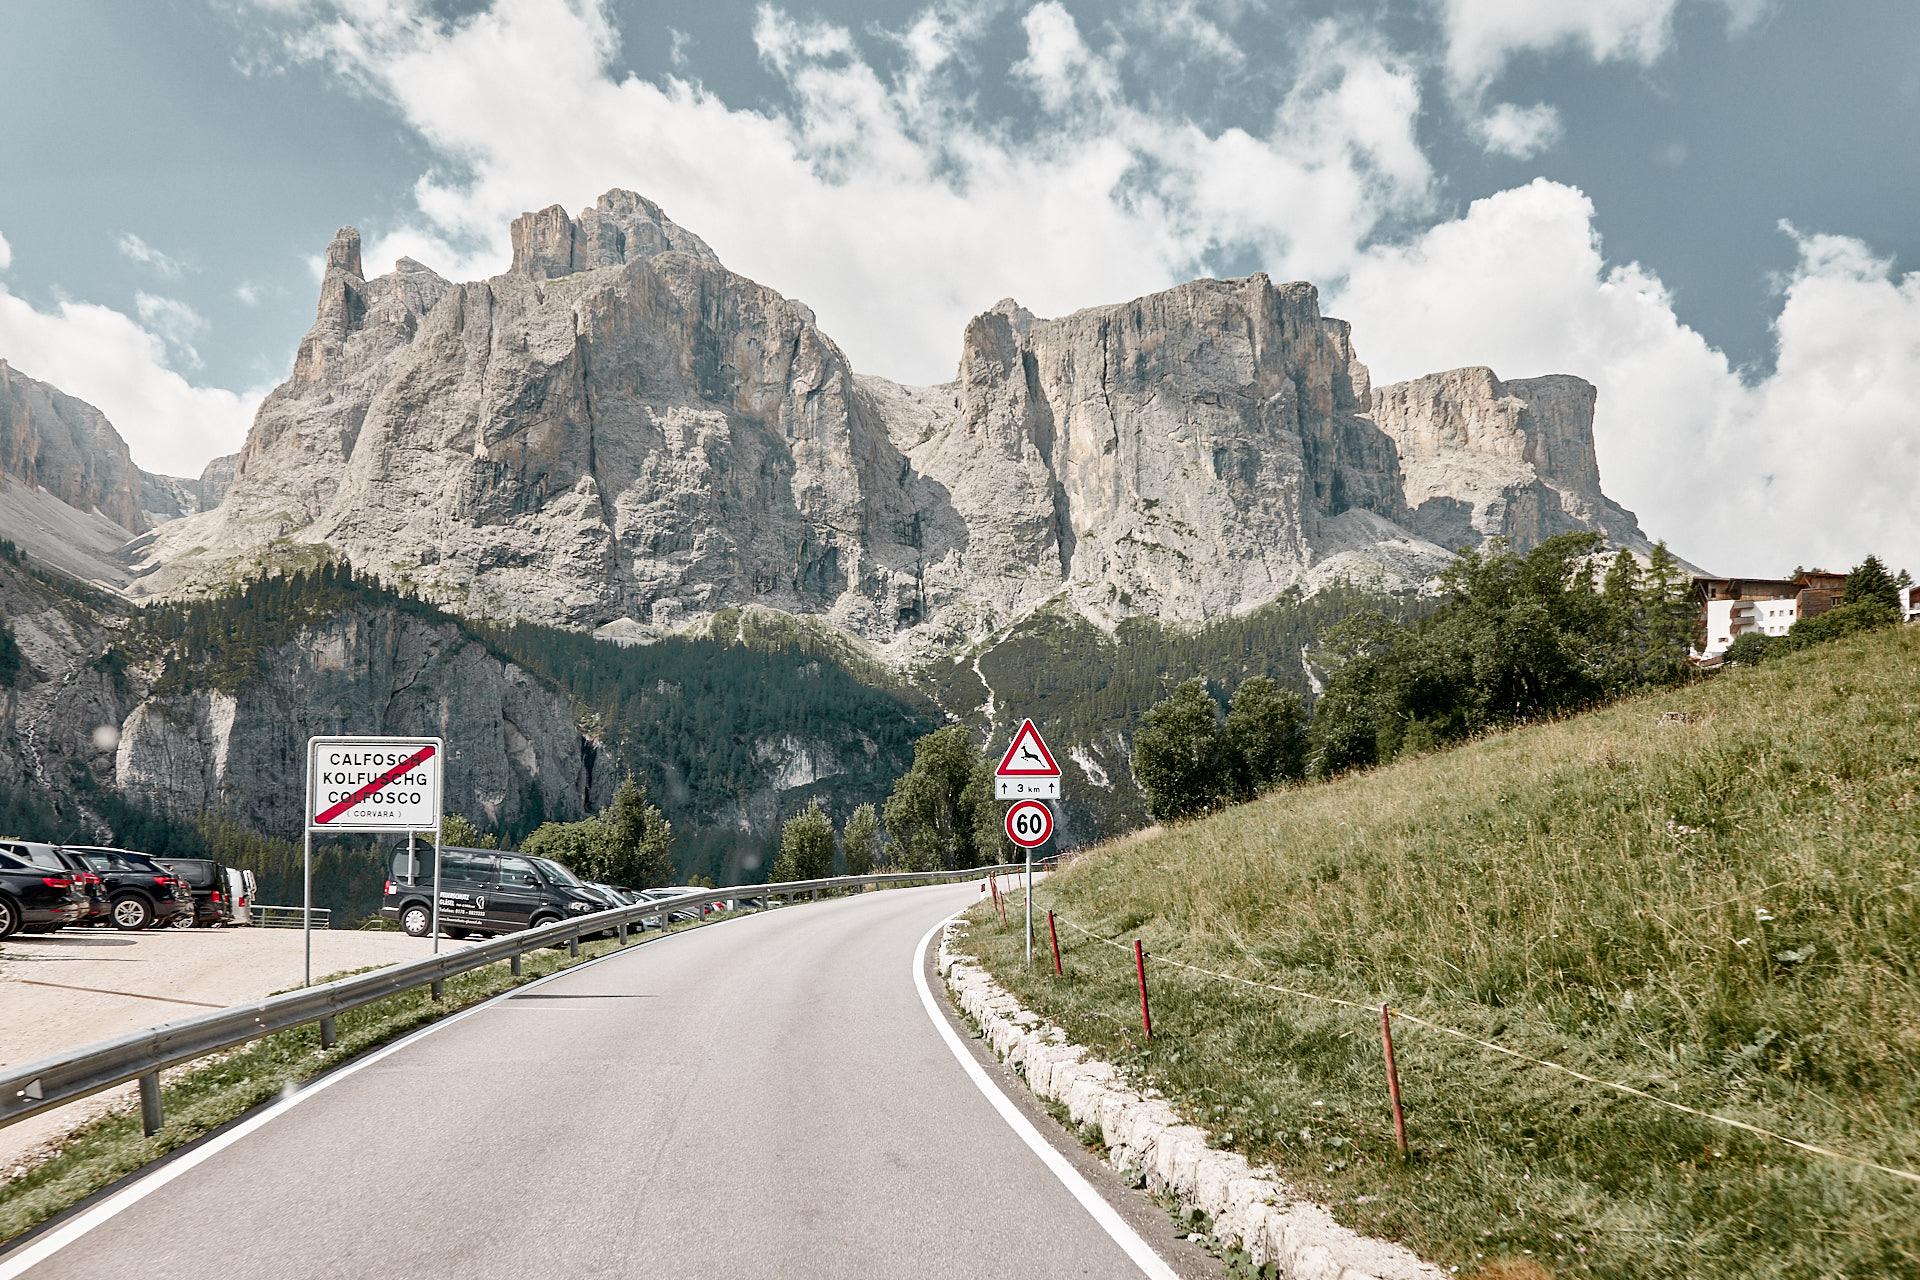 Alta Badia, Corvara, Kolfuschg Colfosco